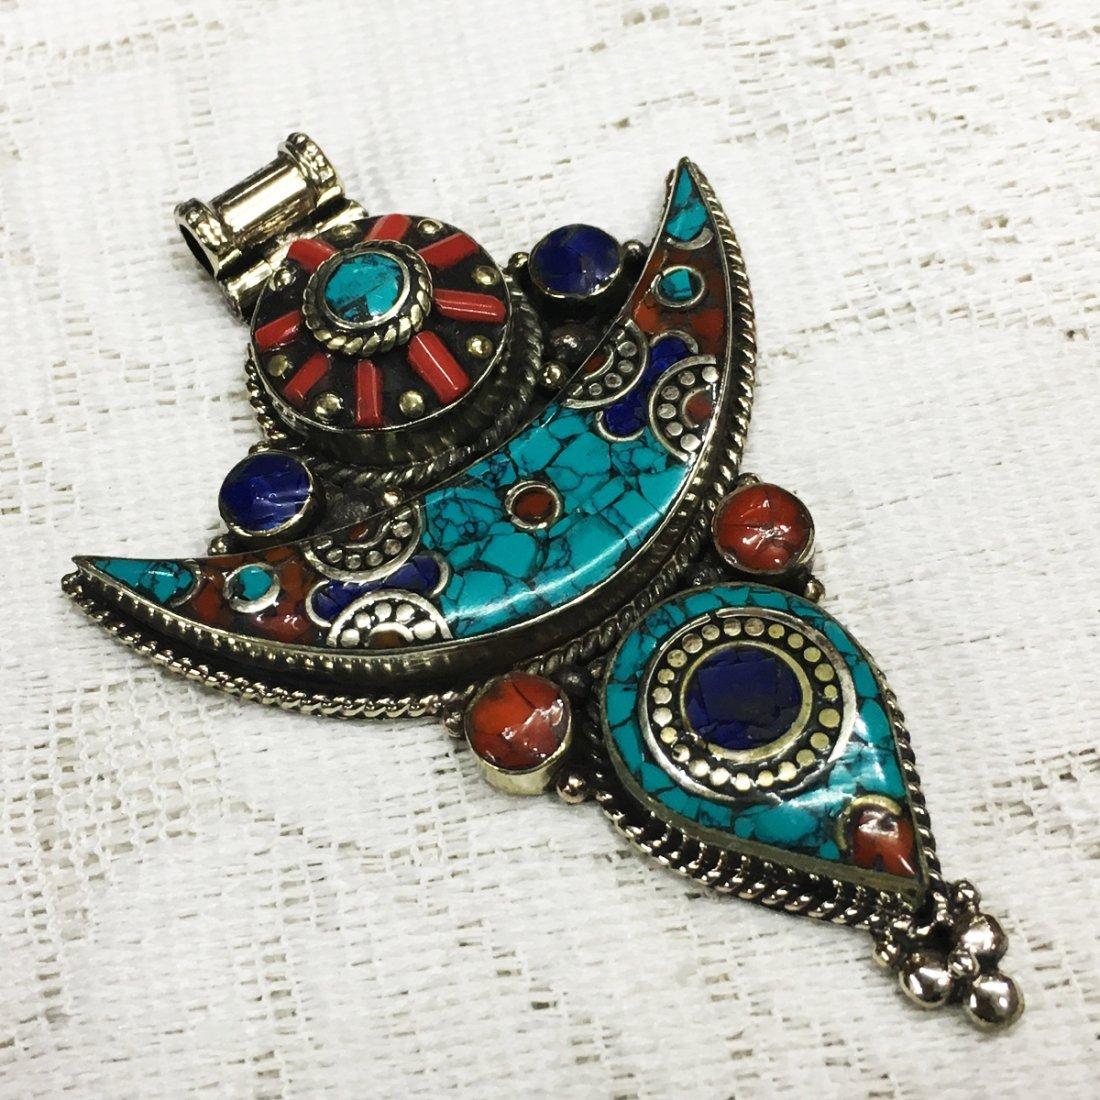 Tibetan Turquoise & Coral Nepali Handmade Pendant